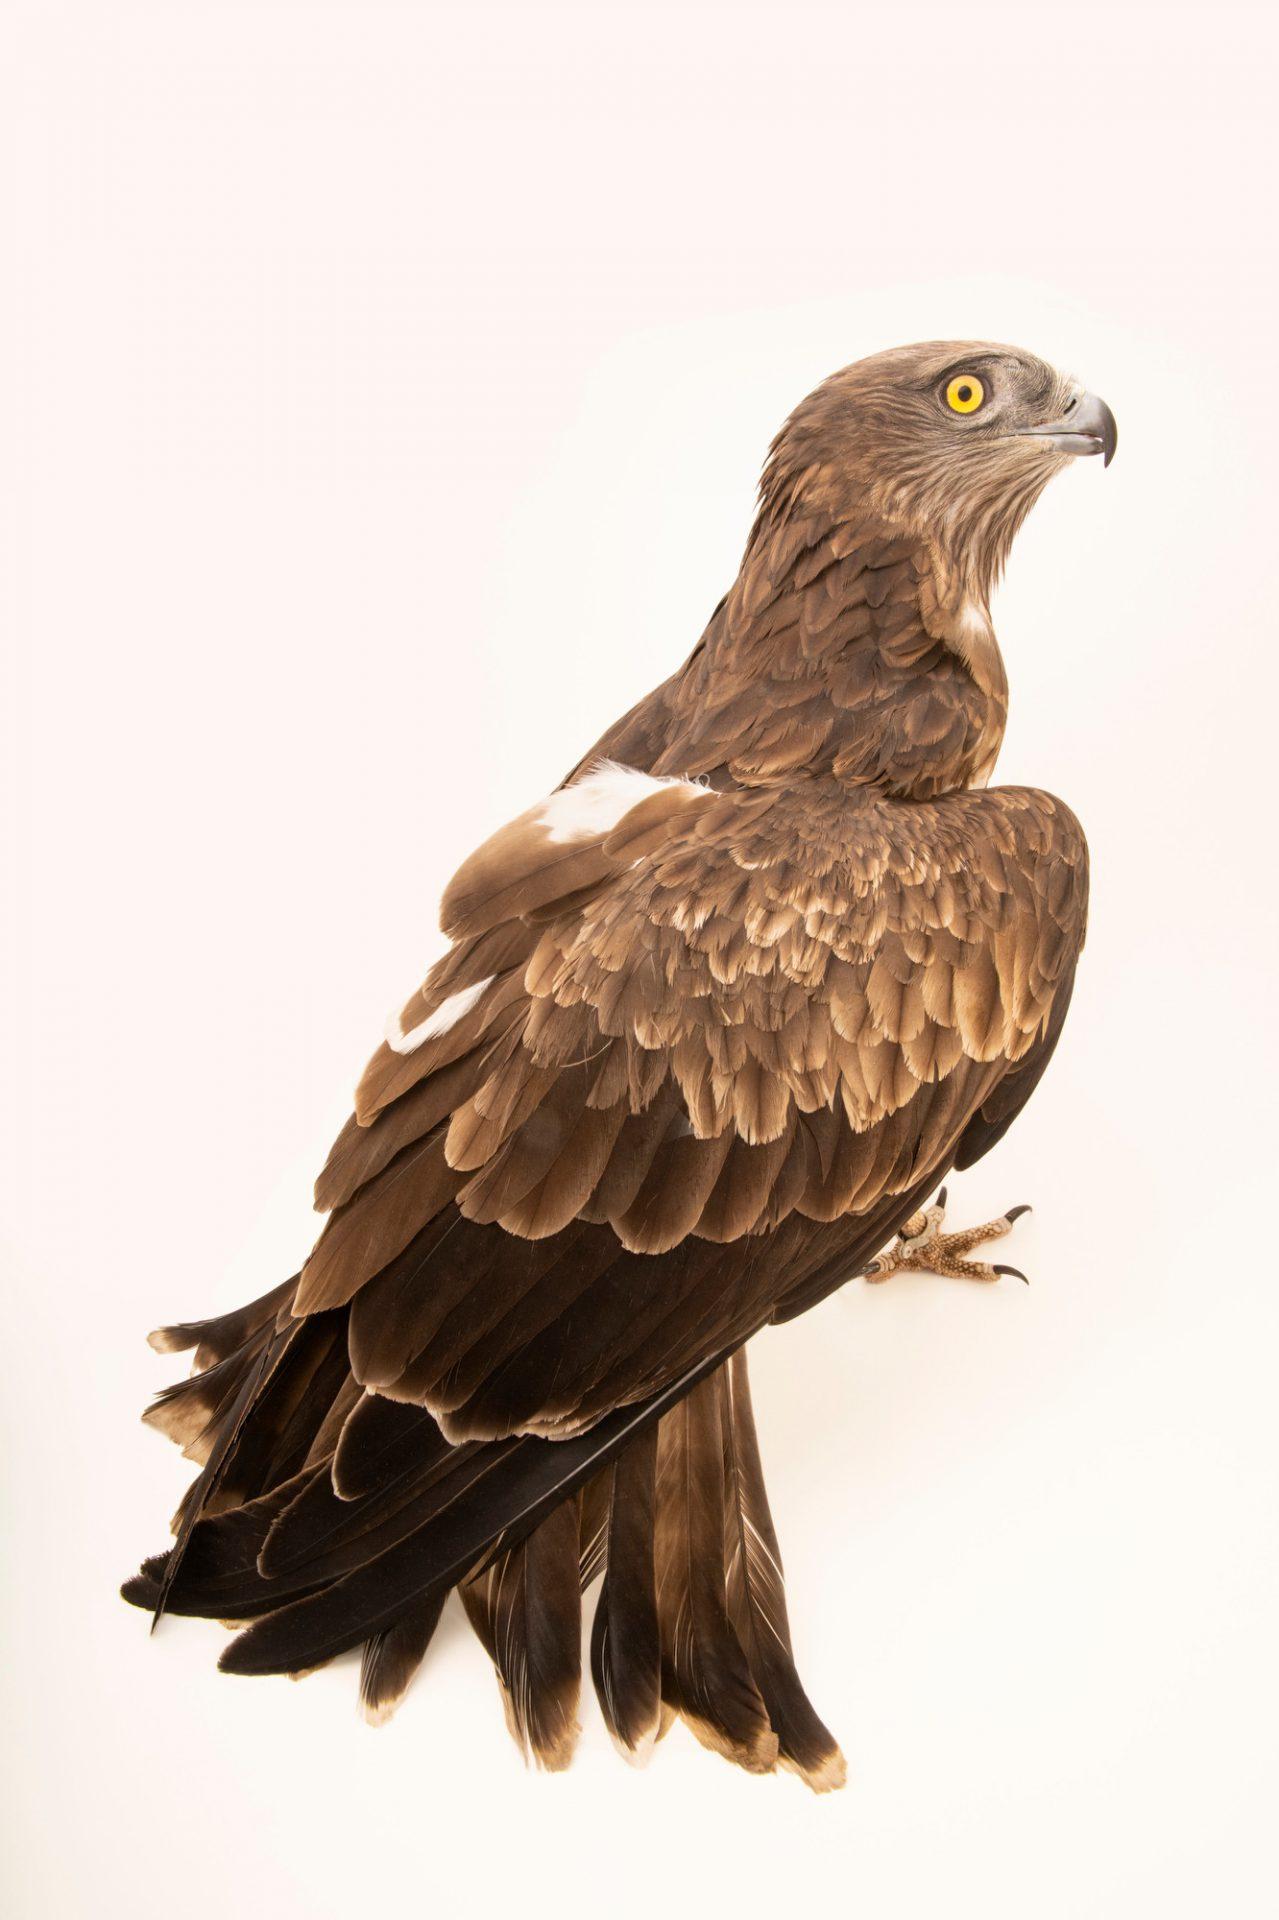 A short-toed snake eagle (Circaetus gallicus gallicus) at Parque Biologico in Vila Nova de Gaia, Porto, Portugal.